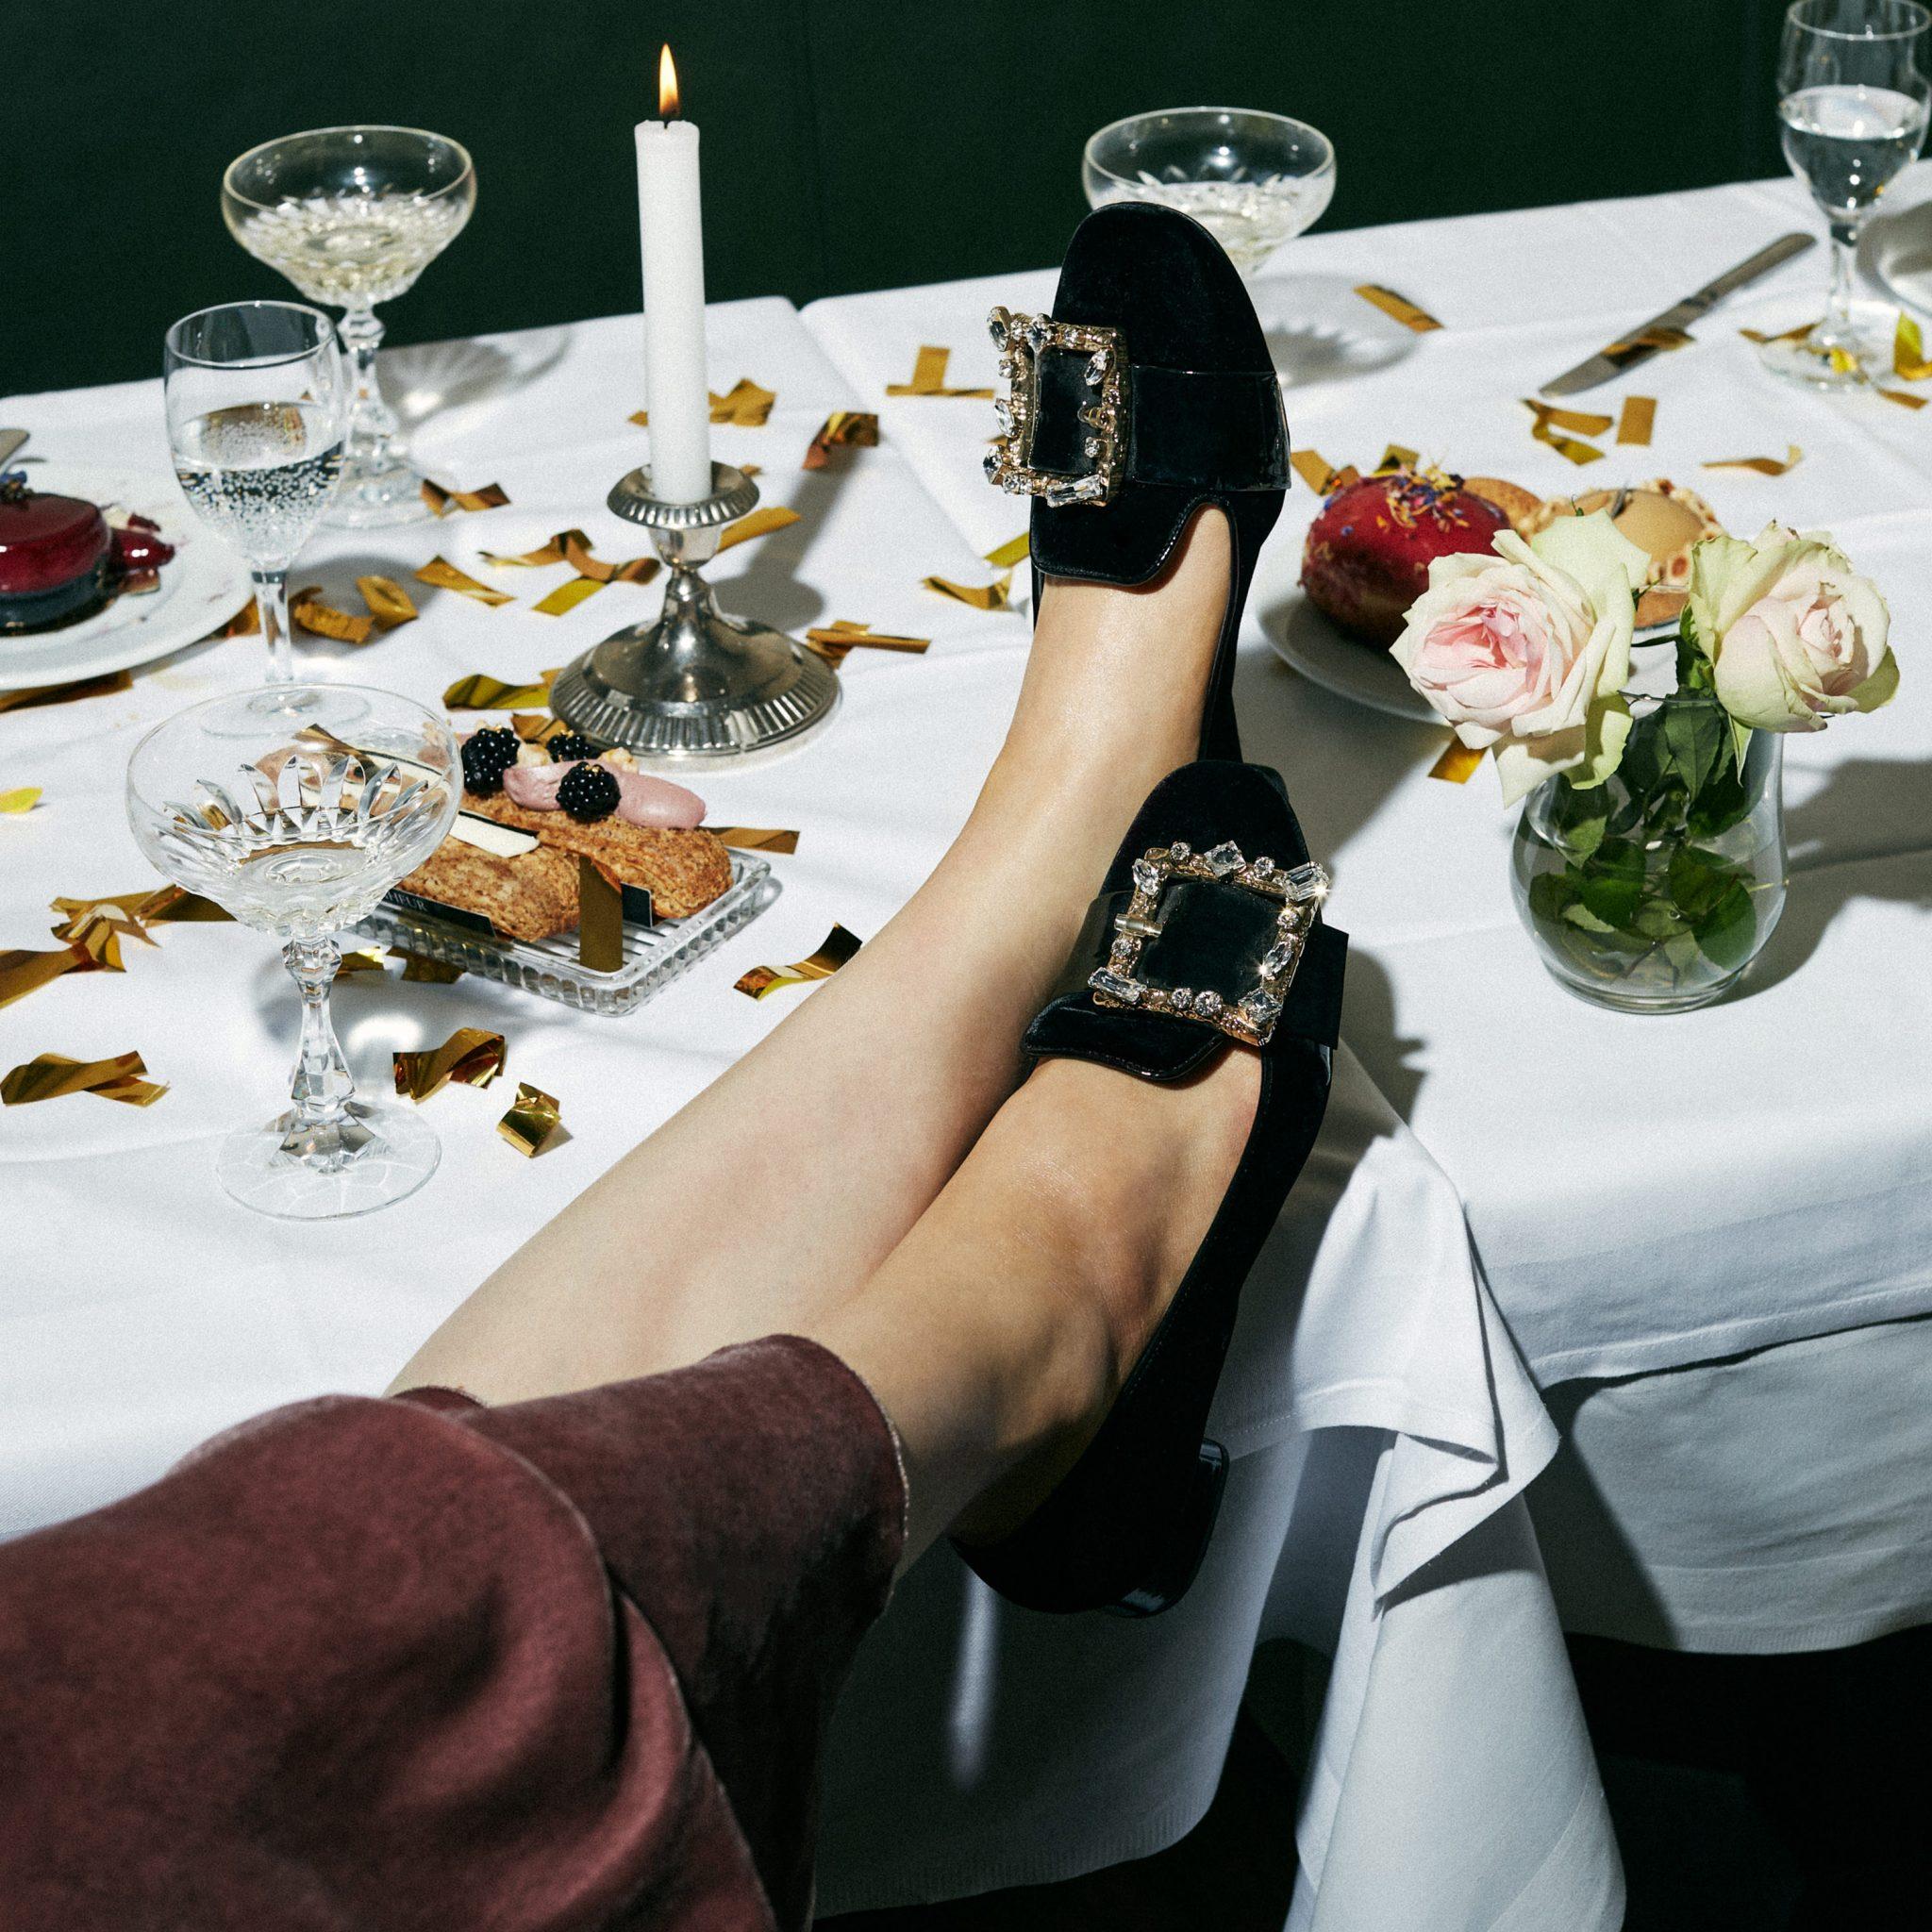 miu miu, shoes, ballet flats, Chrystal shoes, party outfit